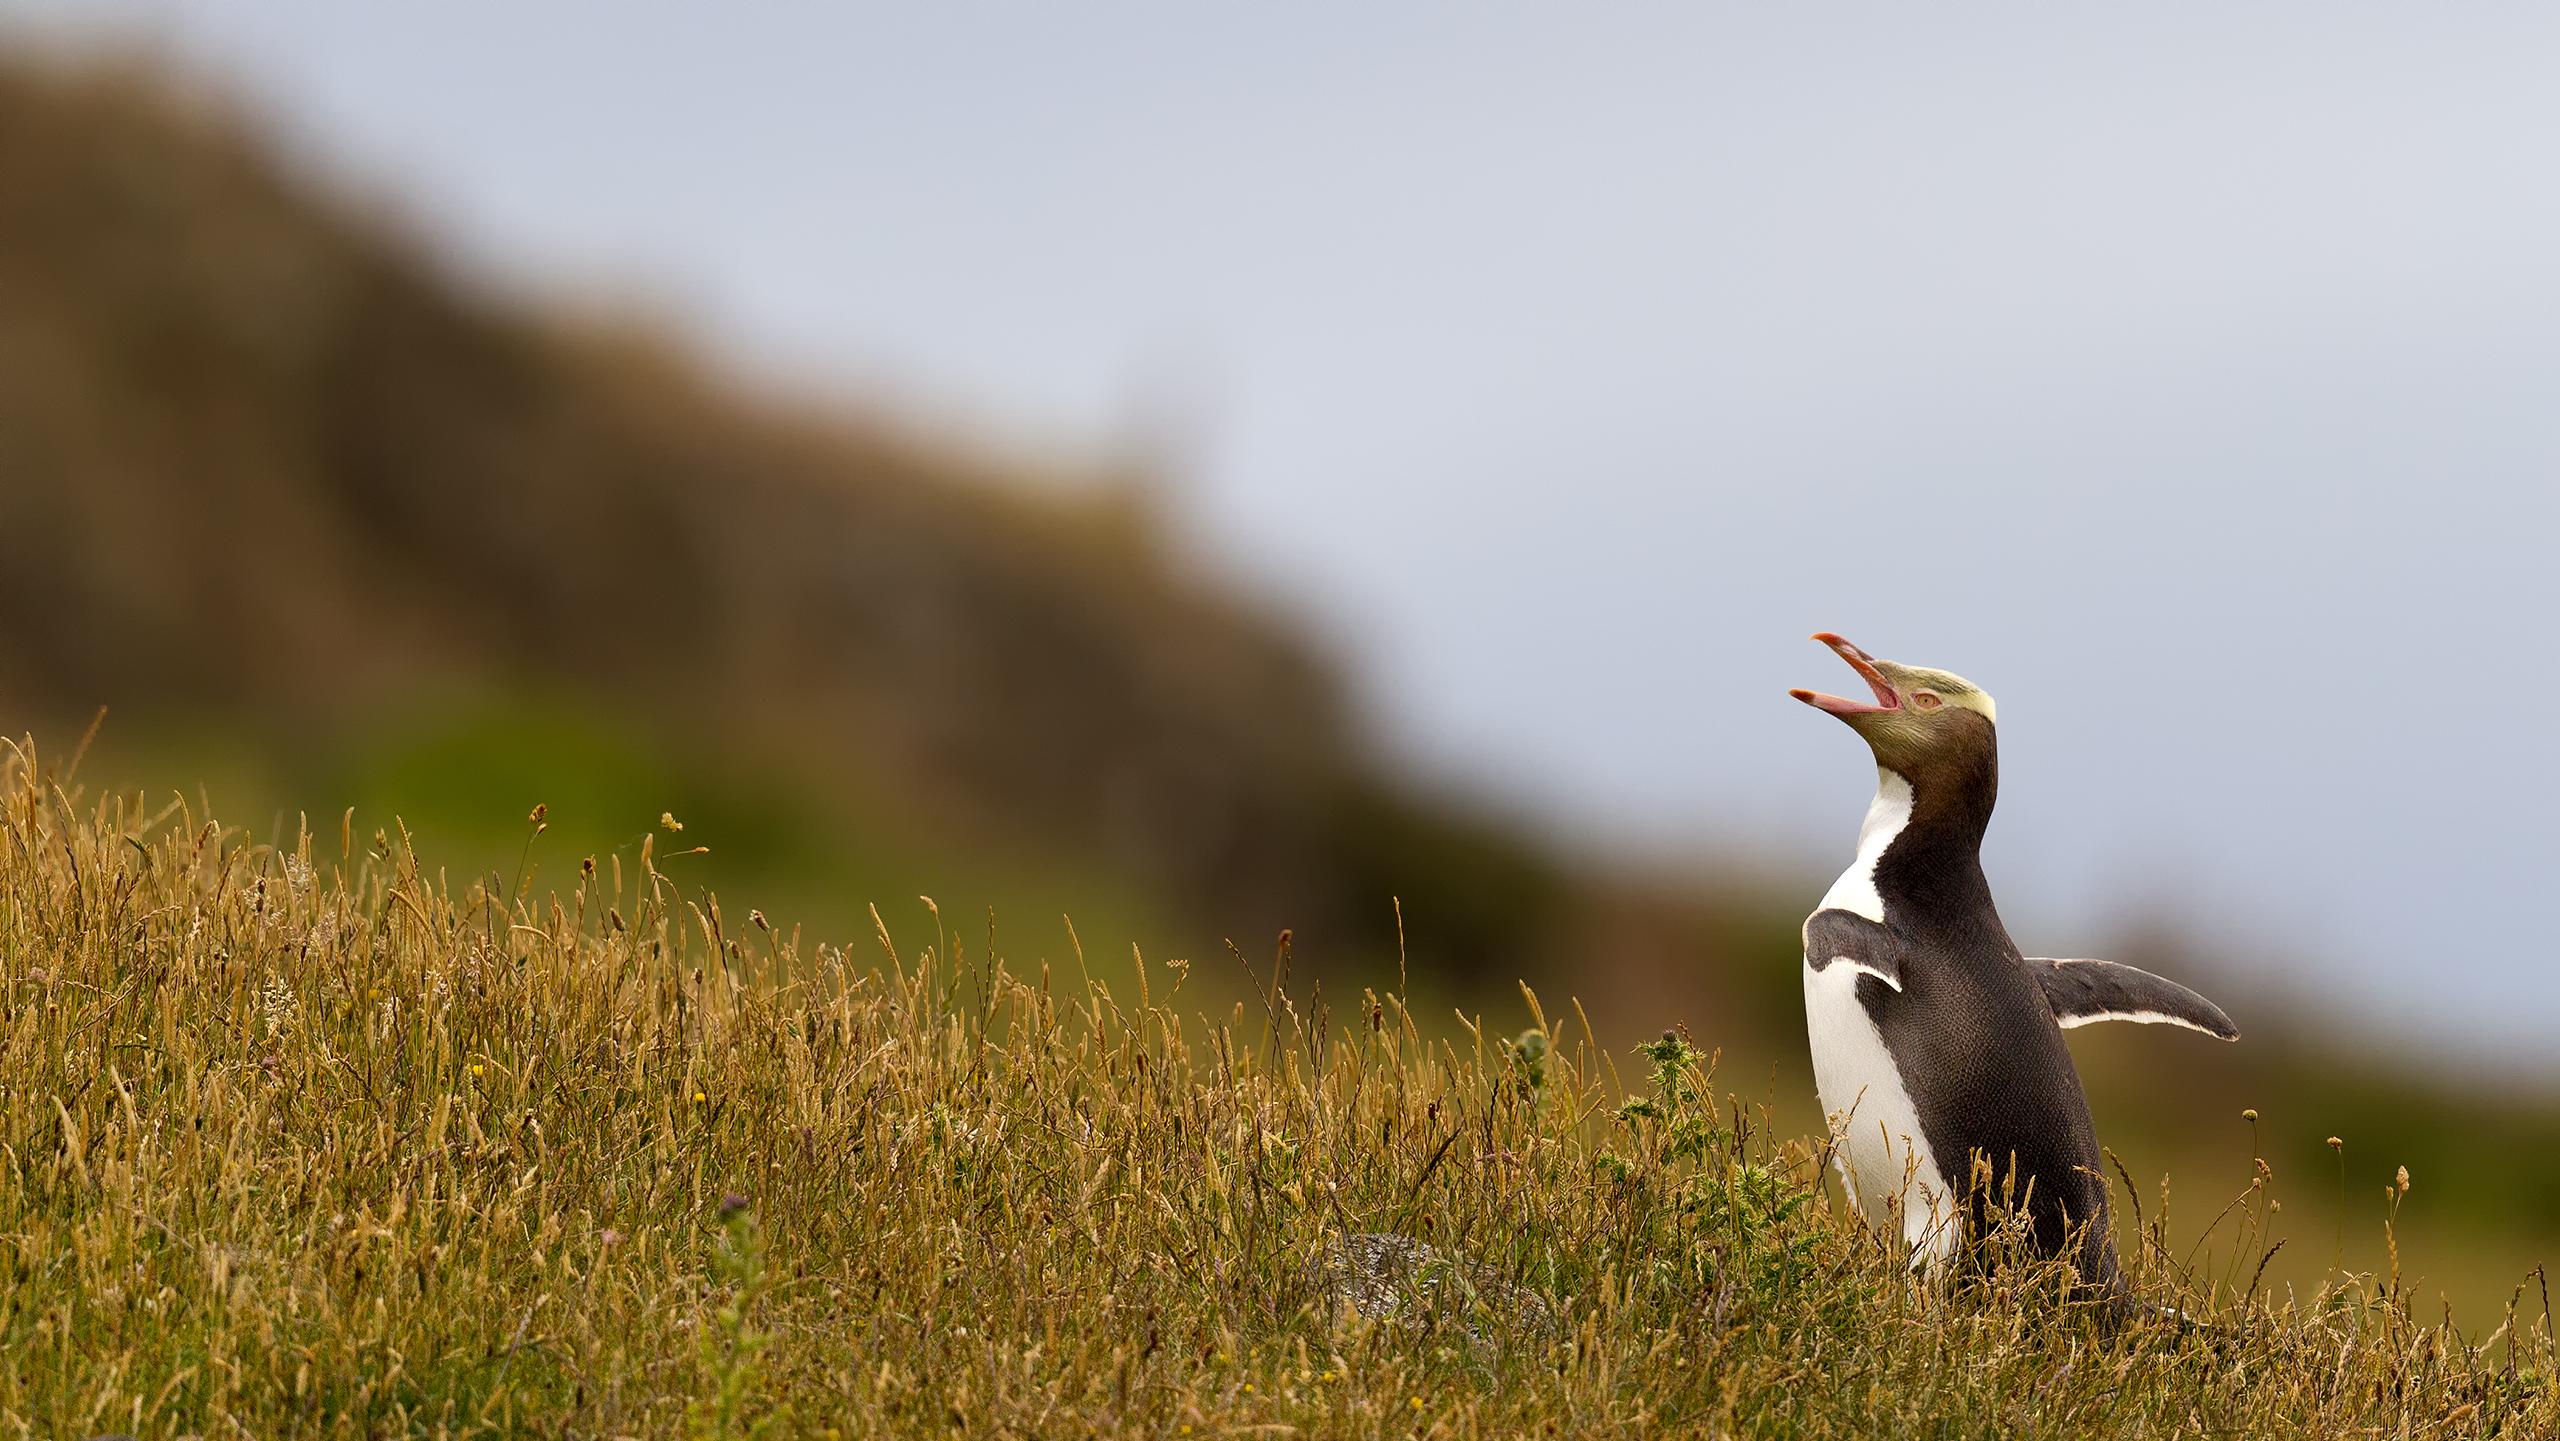 Endangered Yellow Eyed Penguin at New Zealand by Arindam Bhattacharya